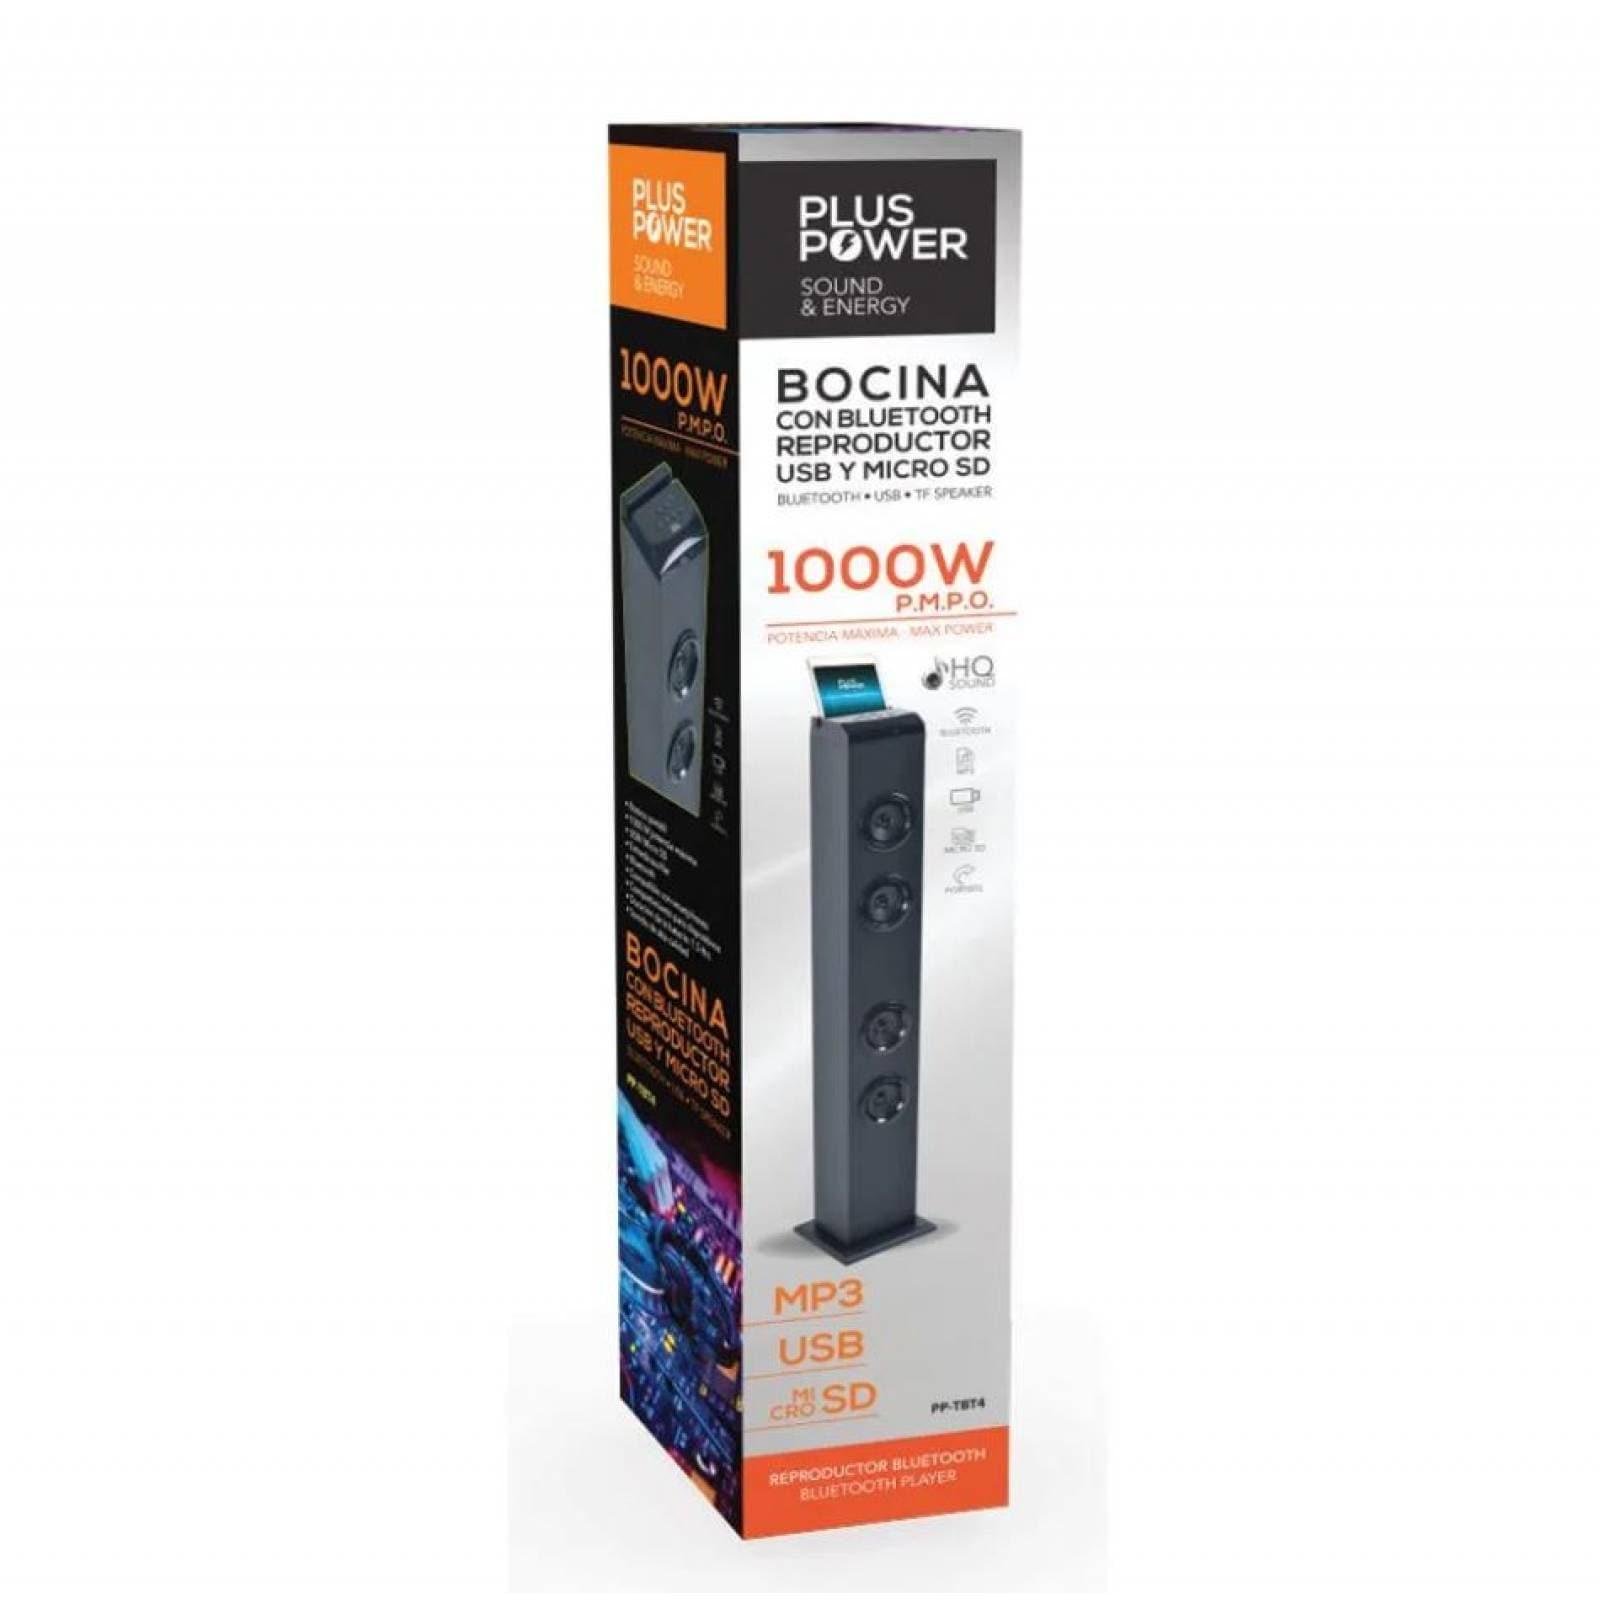 Bocina Tipo Torre Bt Negra Bluetooth Usb / Micro Sd  Pp-tbt4